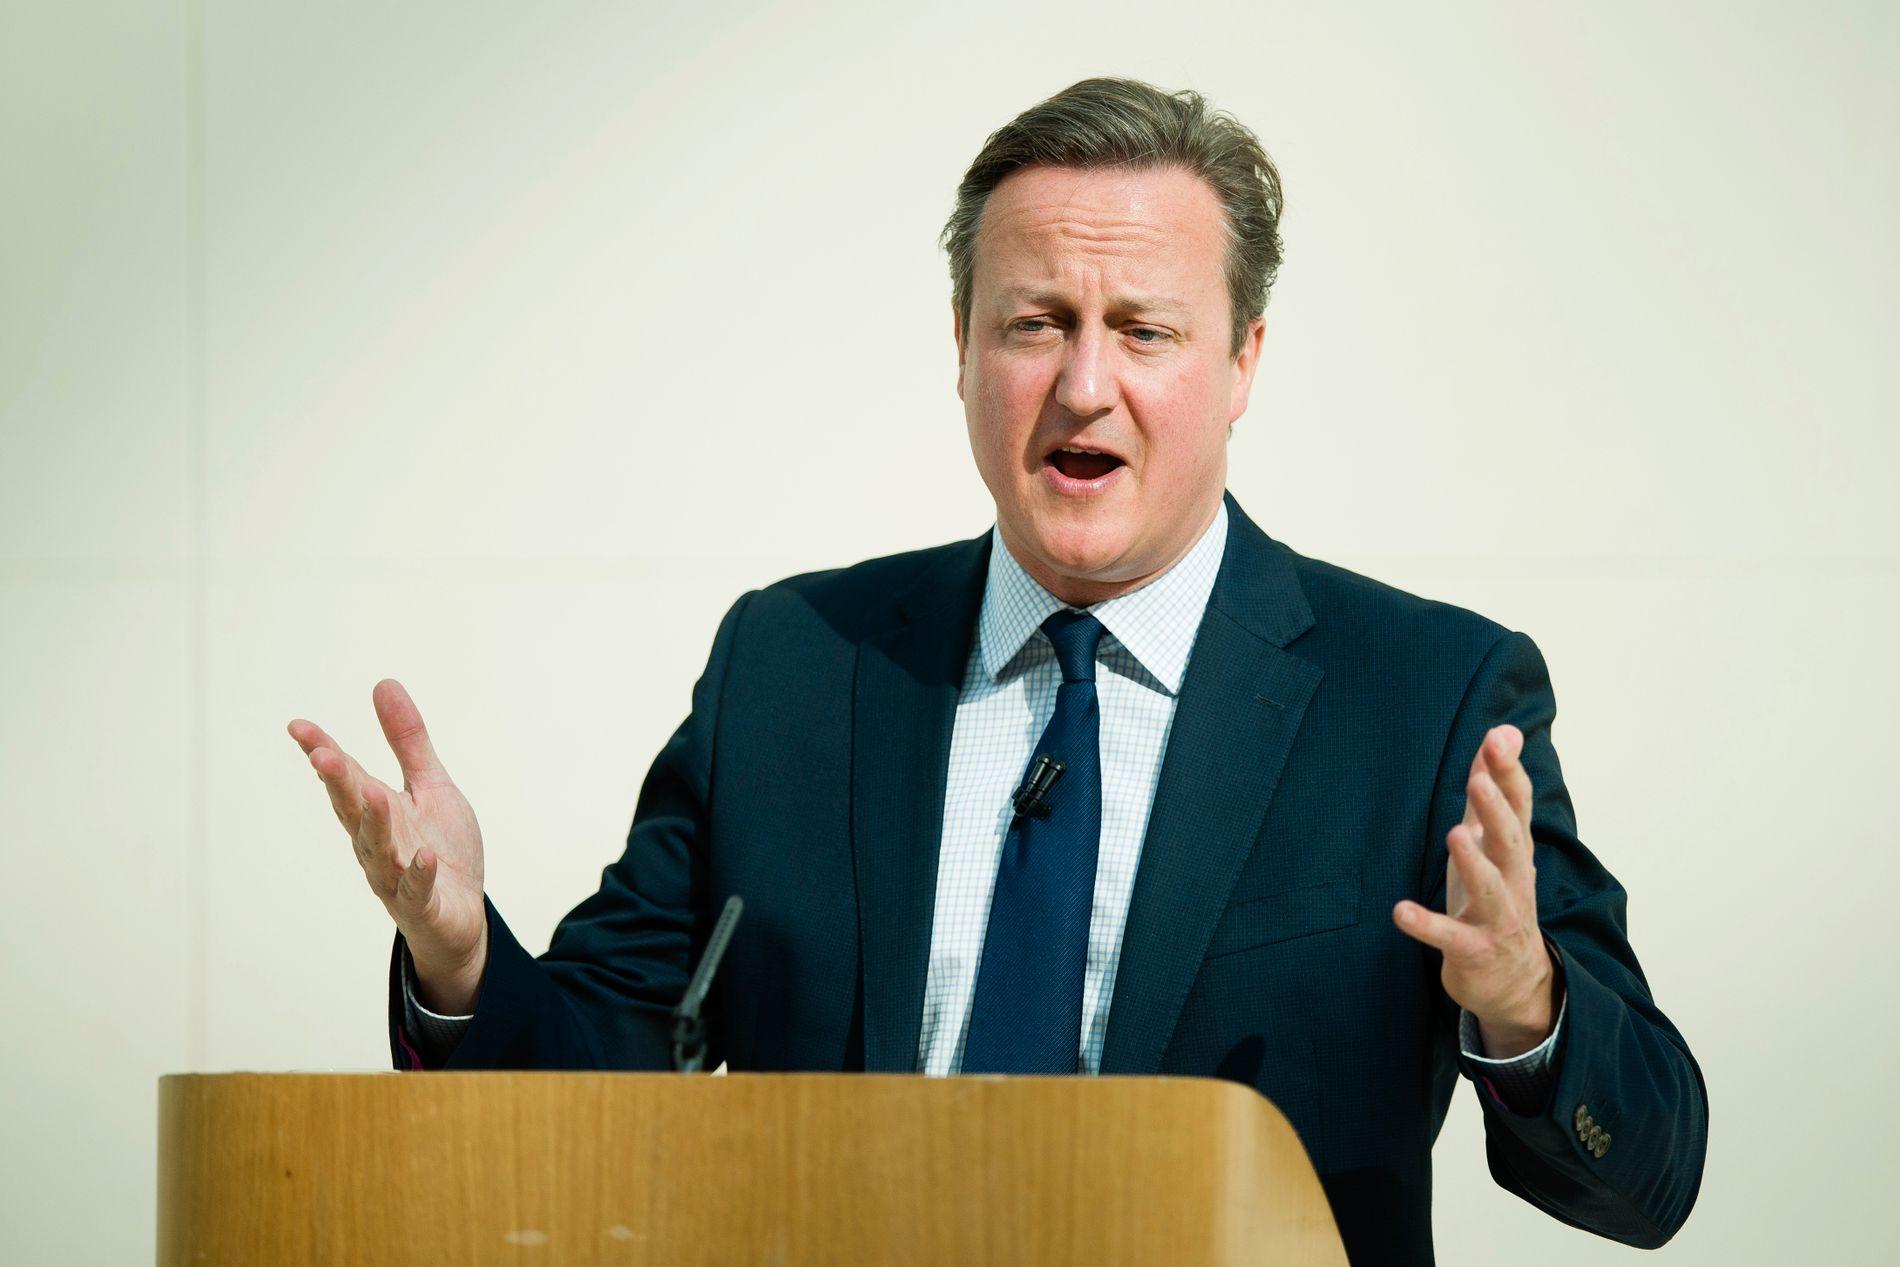 VIL BLI: Storbritannias statsminister David Cameron advarte mot en Brexit under en tale i British Museum mandag.